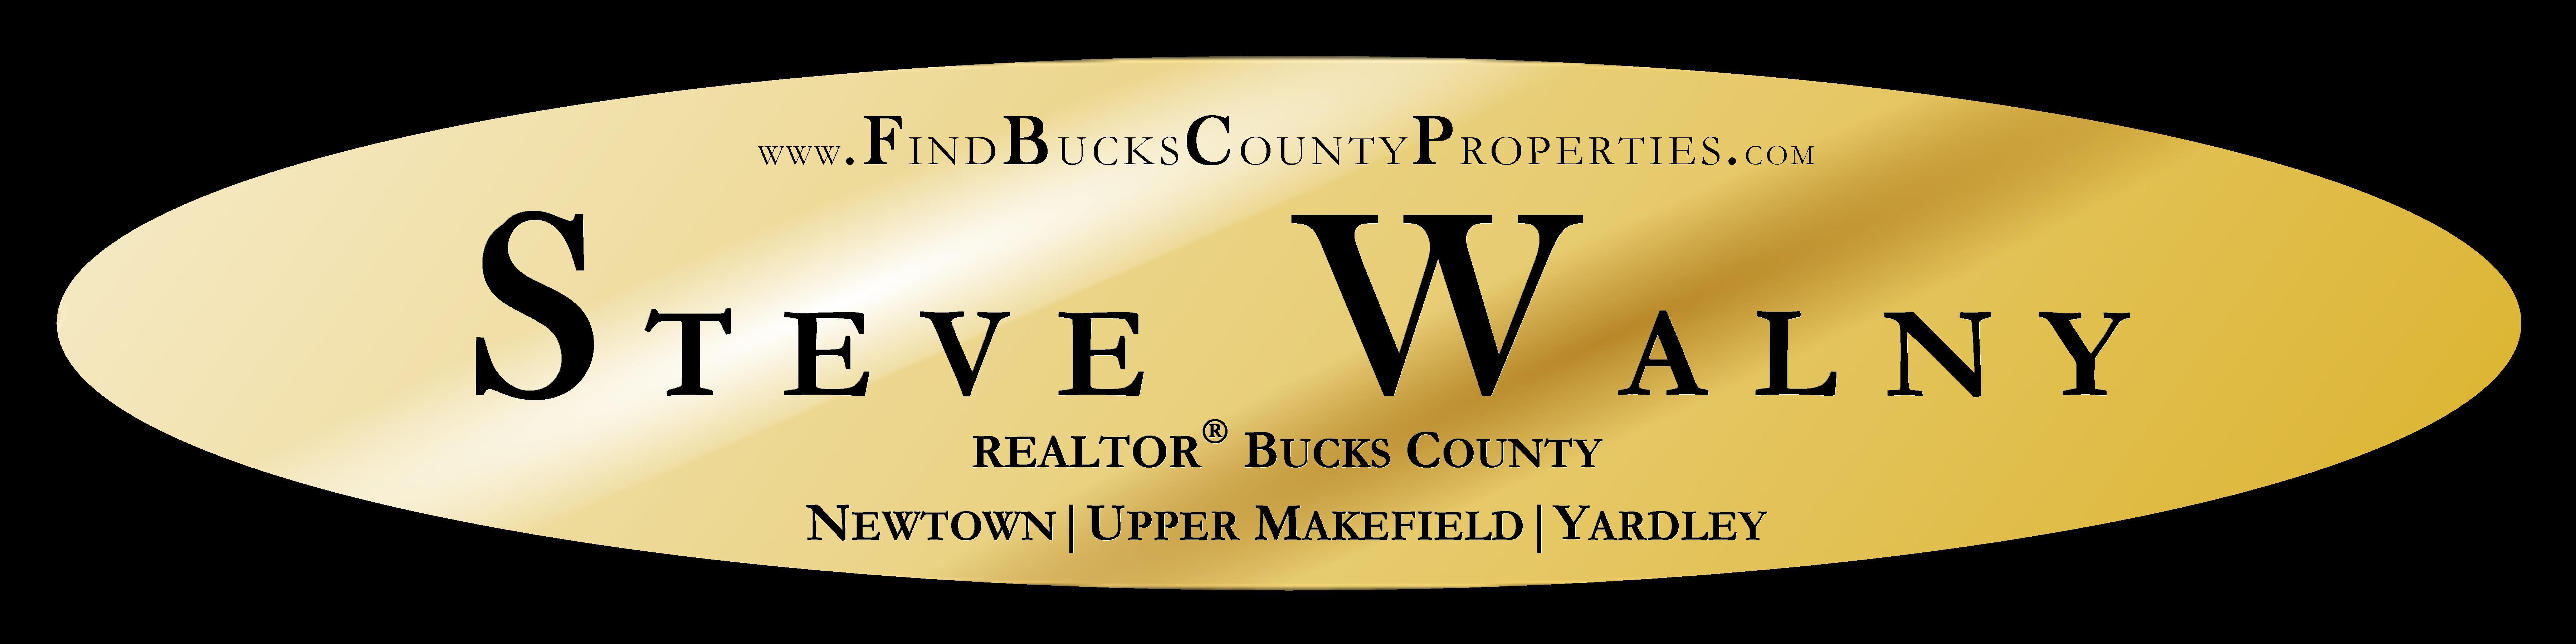 Steve Walny | #SteveWalny | Newtown PA Realtor | #NewtownPARealtor | Newtown Realtor | #NewtownRealtor